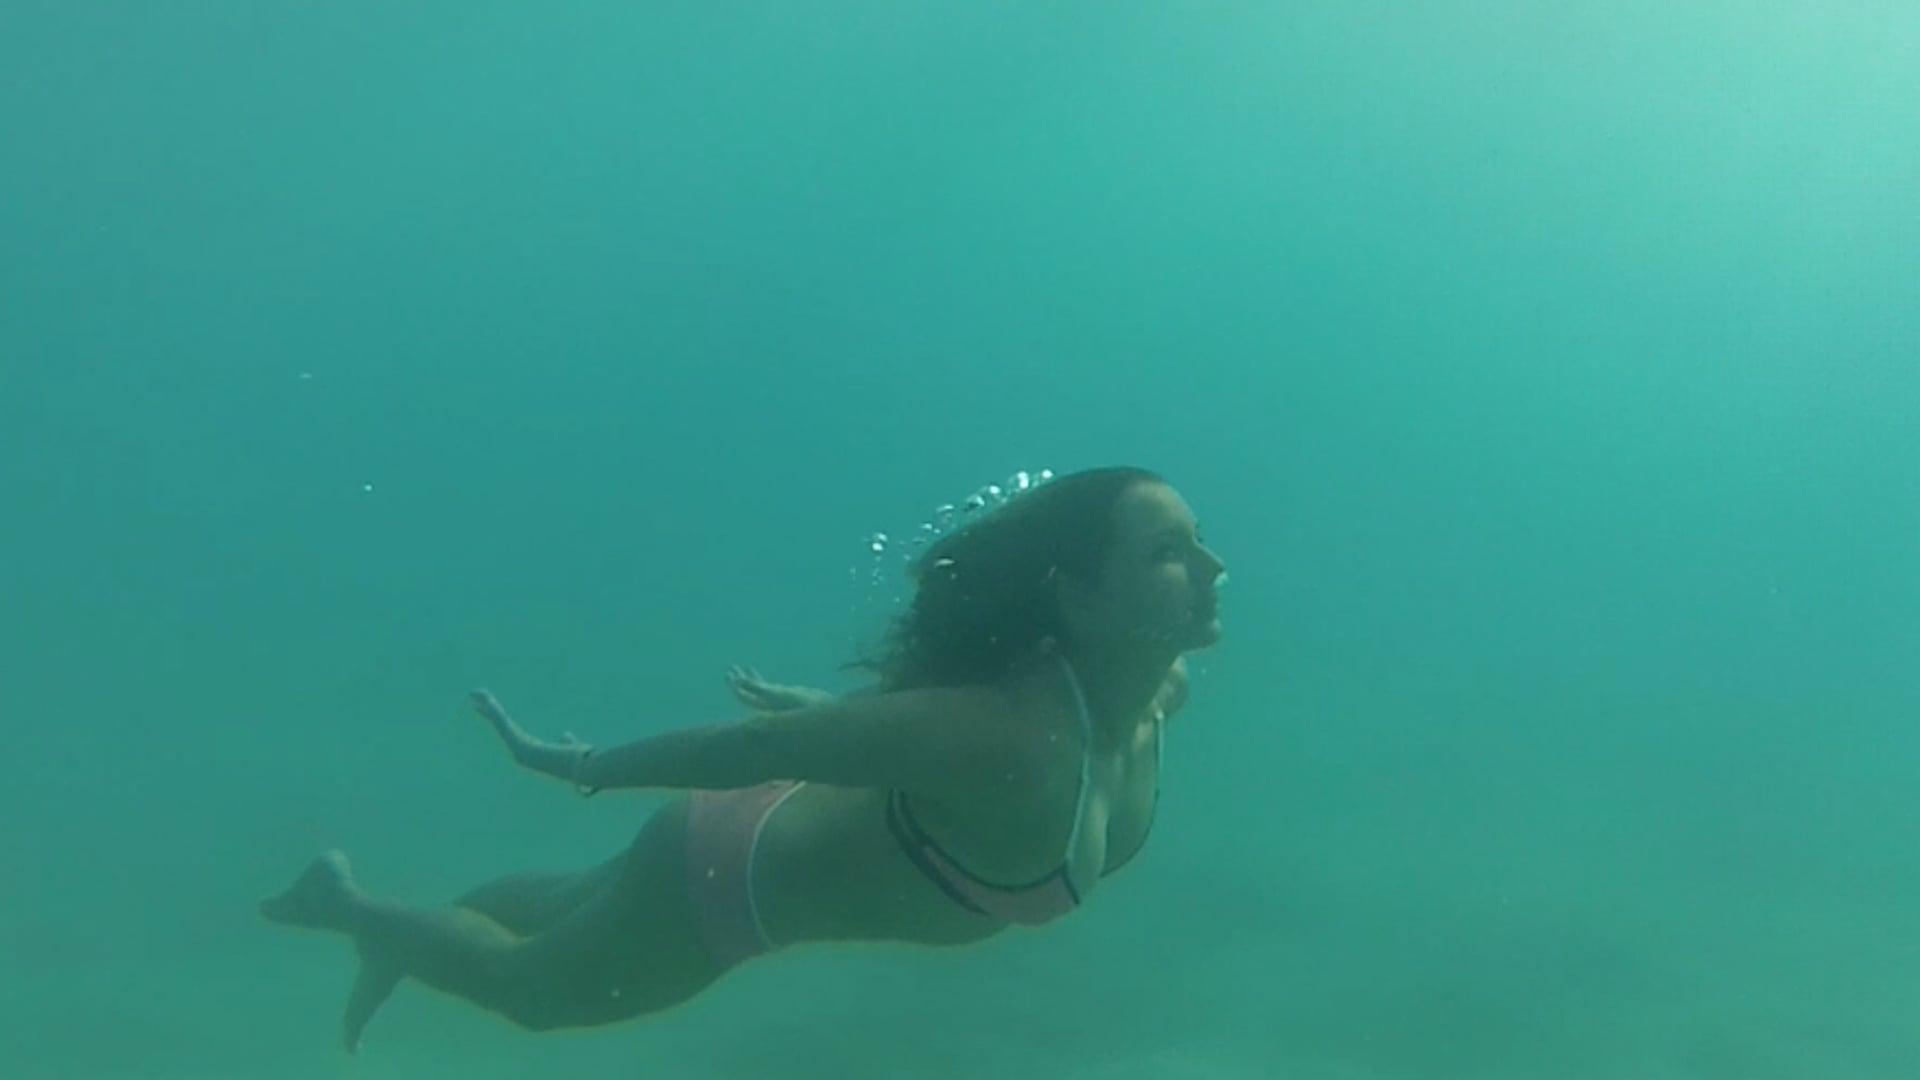 Big Wave Surfer Maya Gabeira